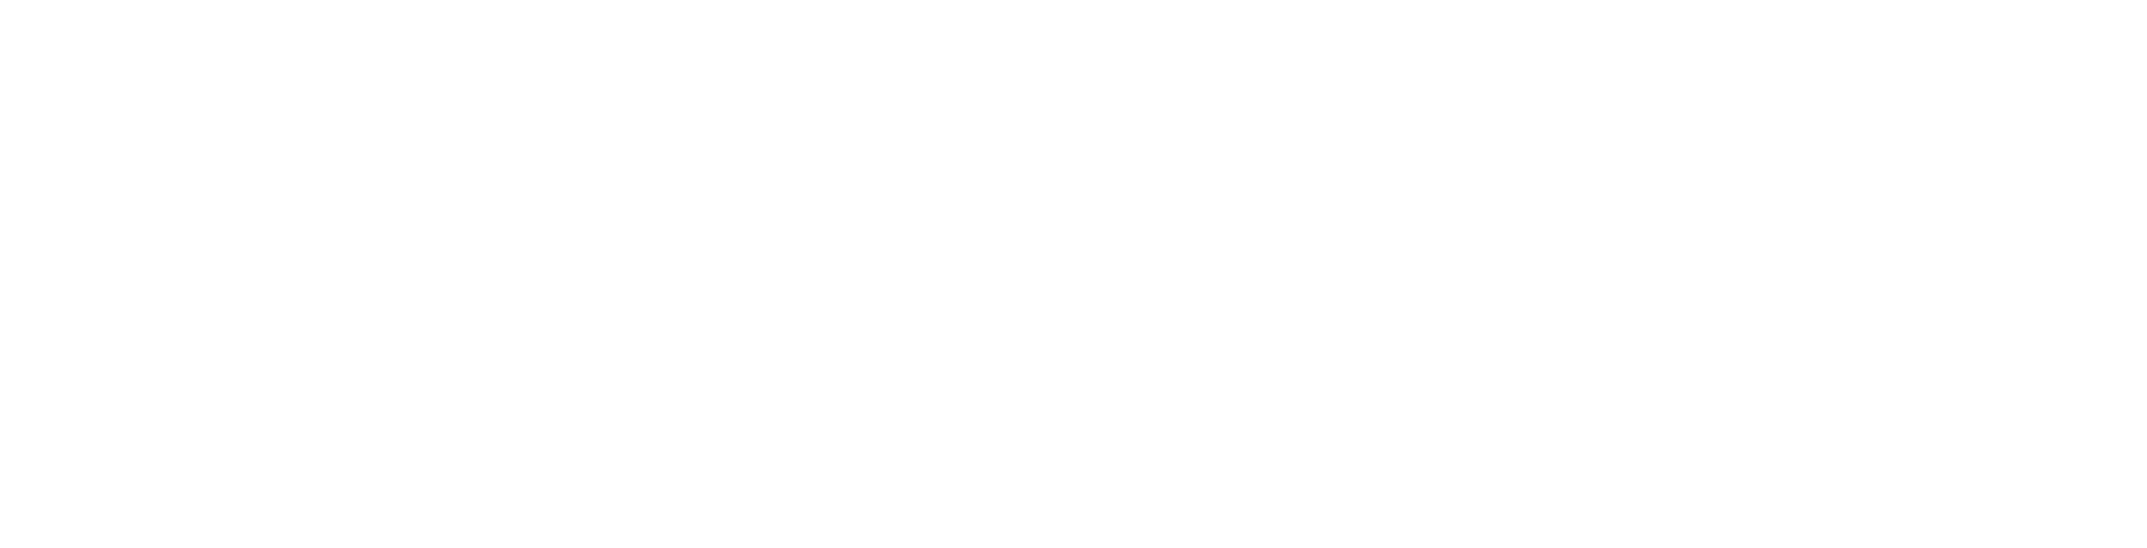 CobbleStone Contract Management Software